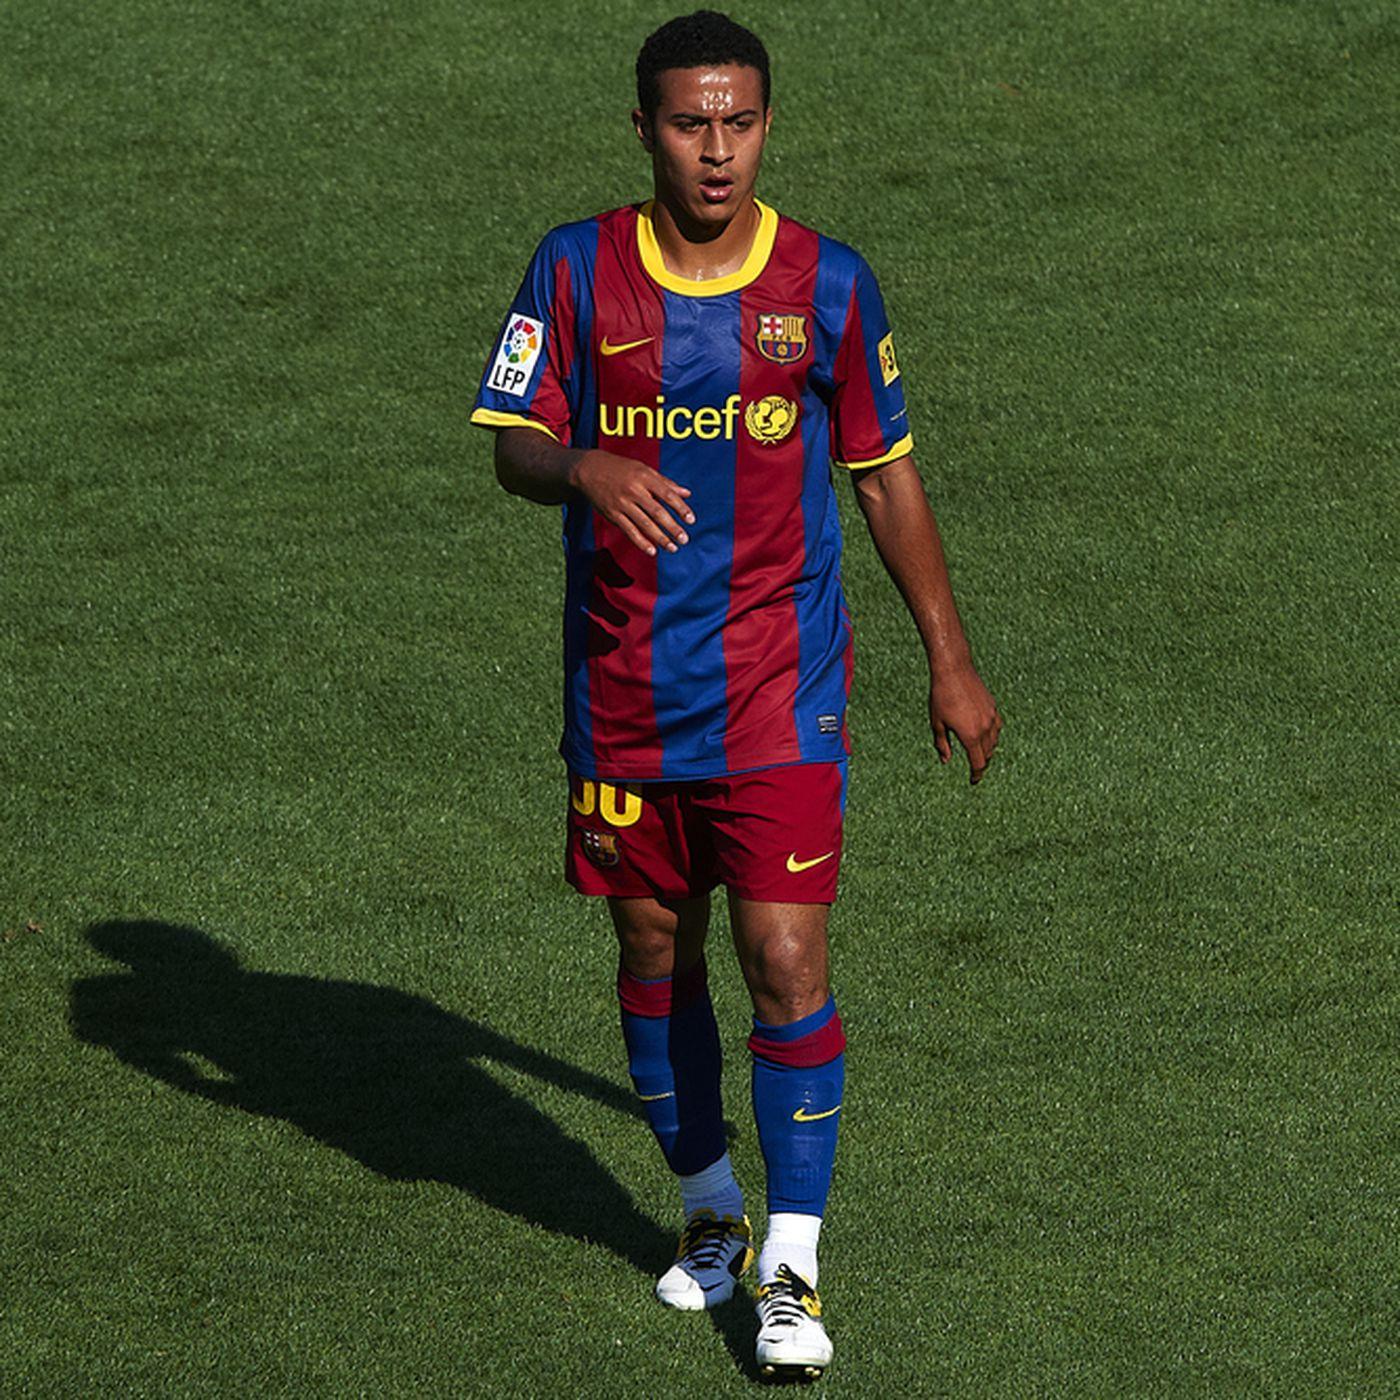 Fc Barcelona 2010 11 Season In Review Thiago Alcantara Barca Blaugranes